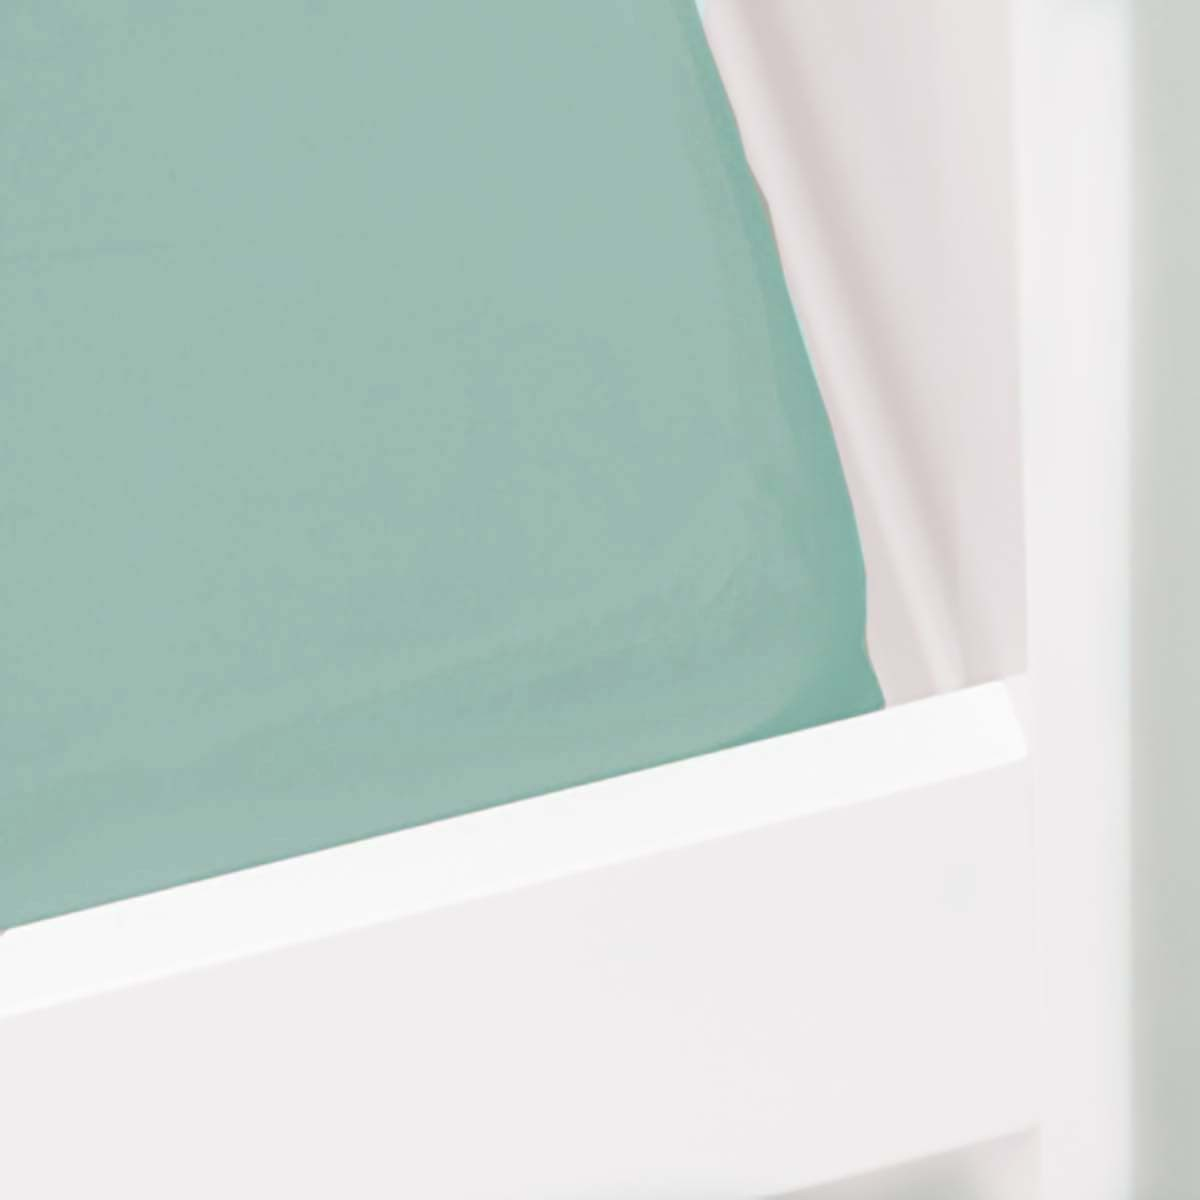 Briljant Hoeslaken Jade 40x80cm (katoen)